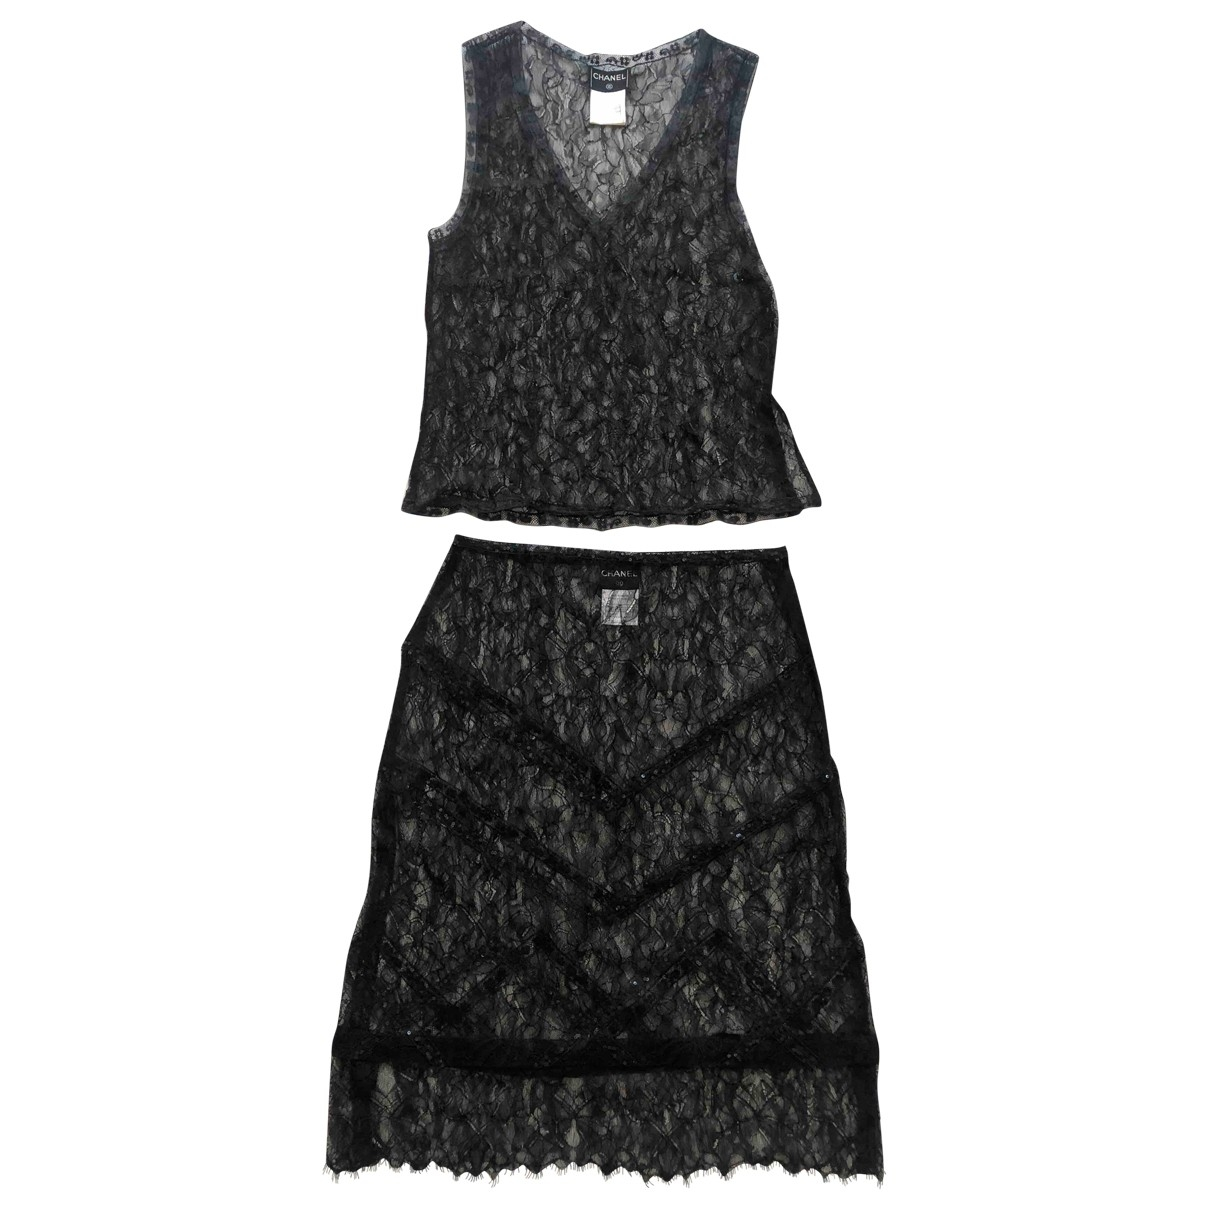 Chanel \N Black Lace dress for Women 40 FR